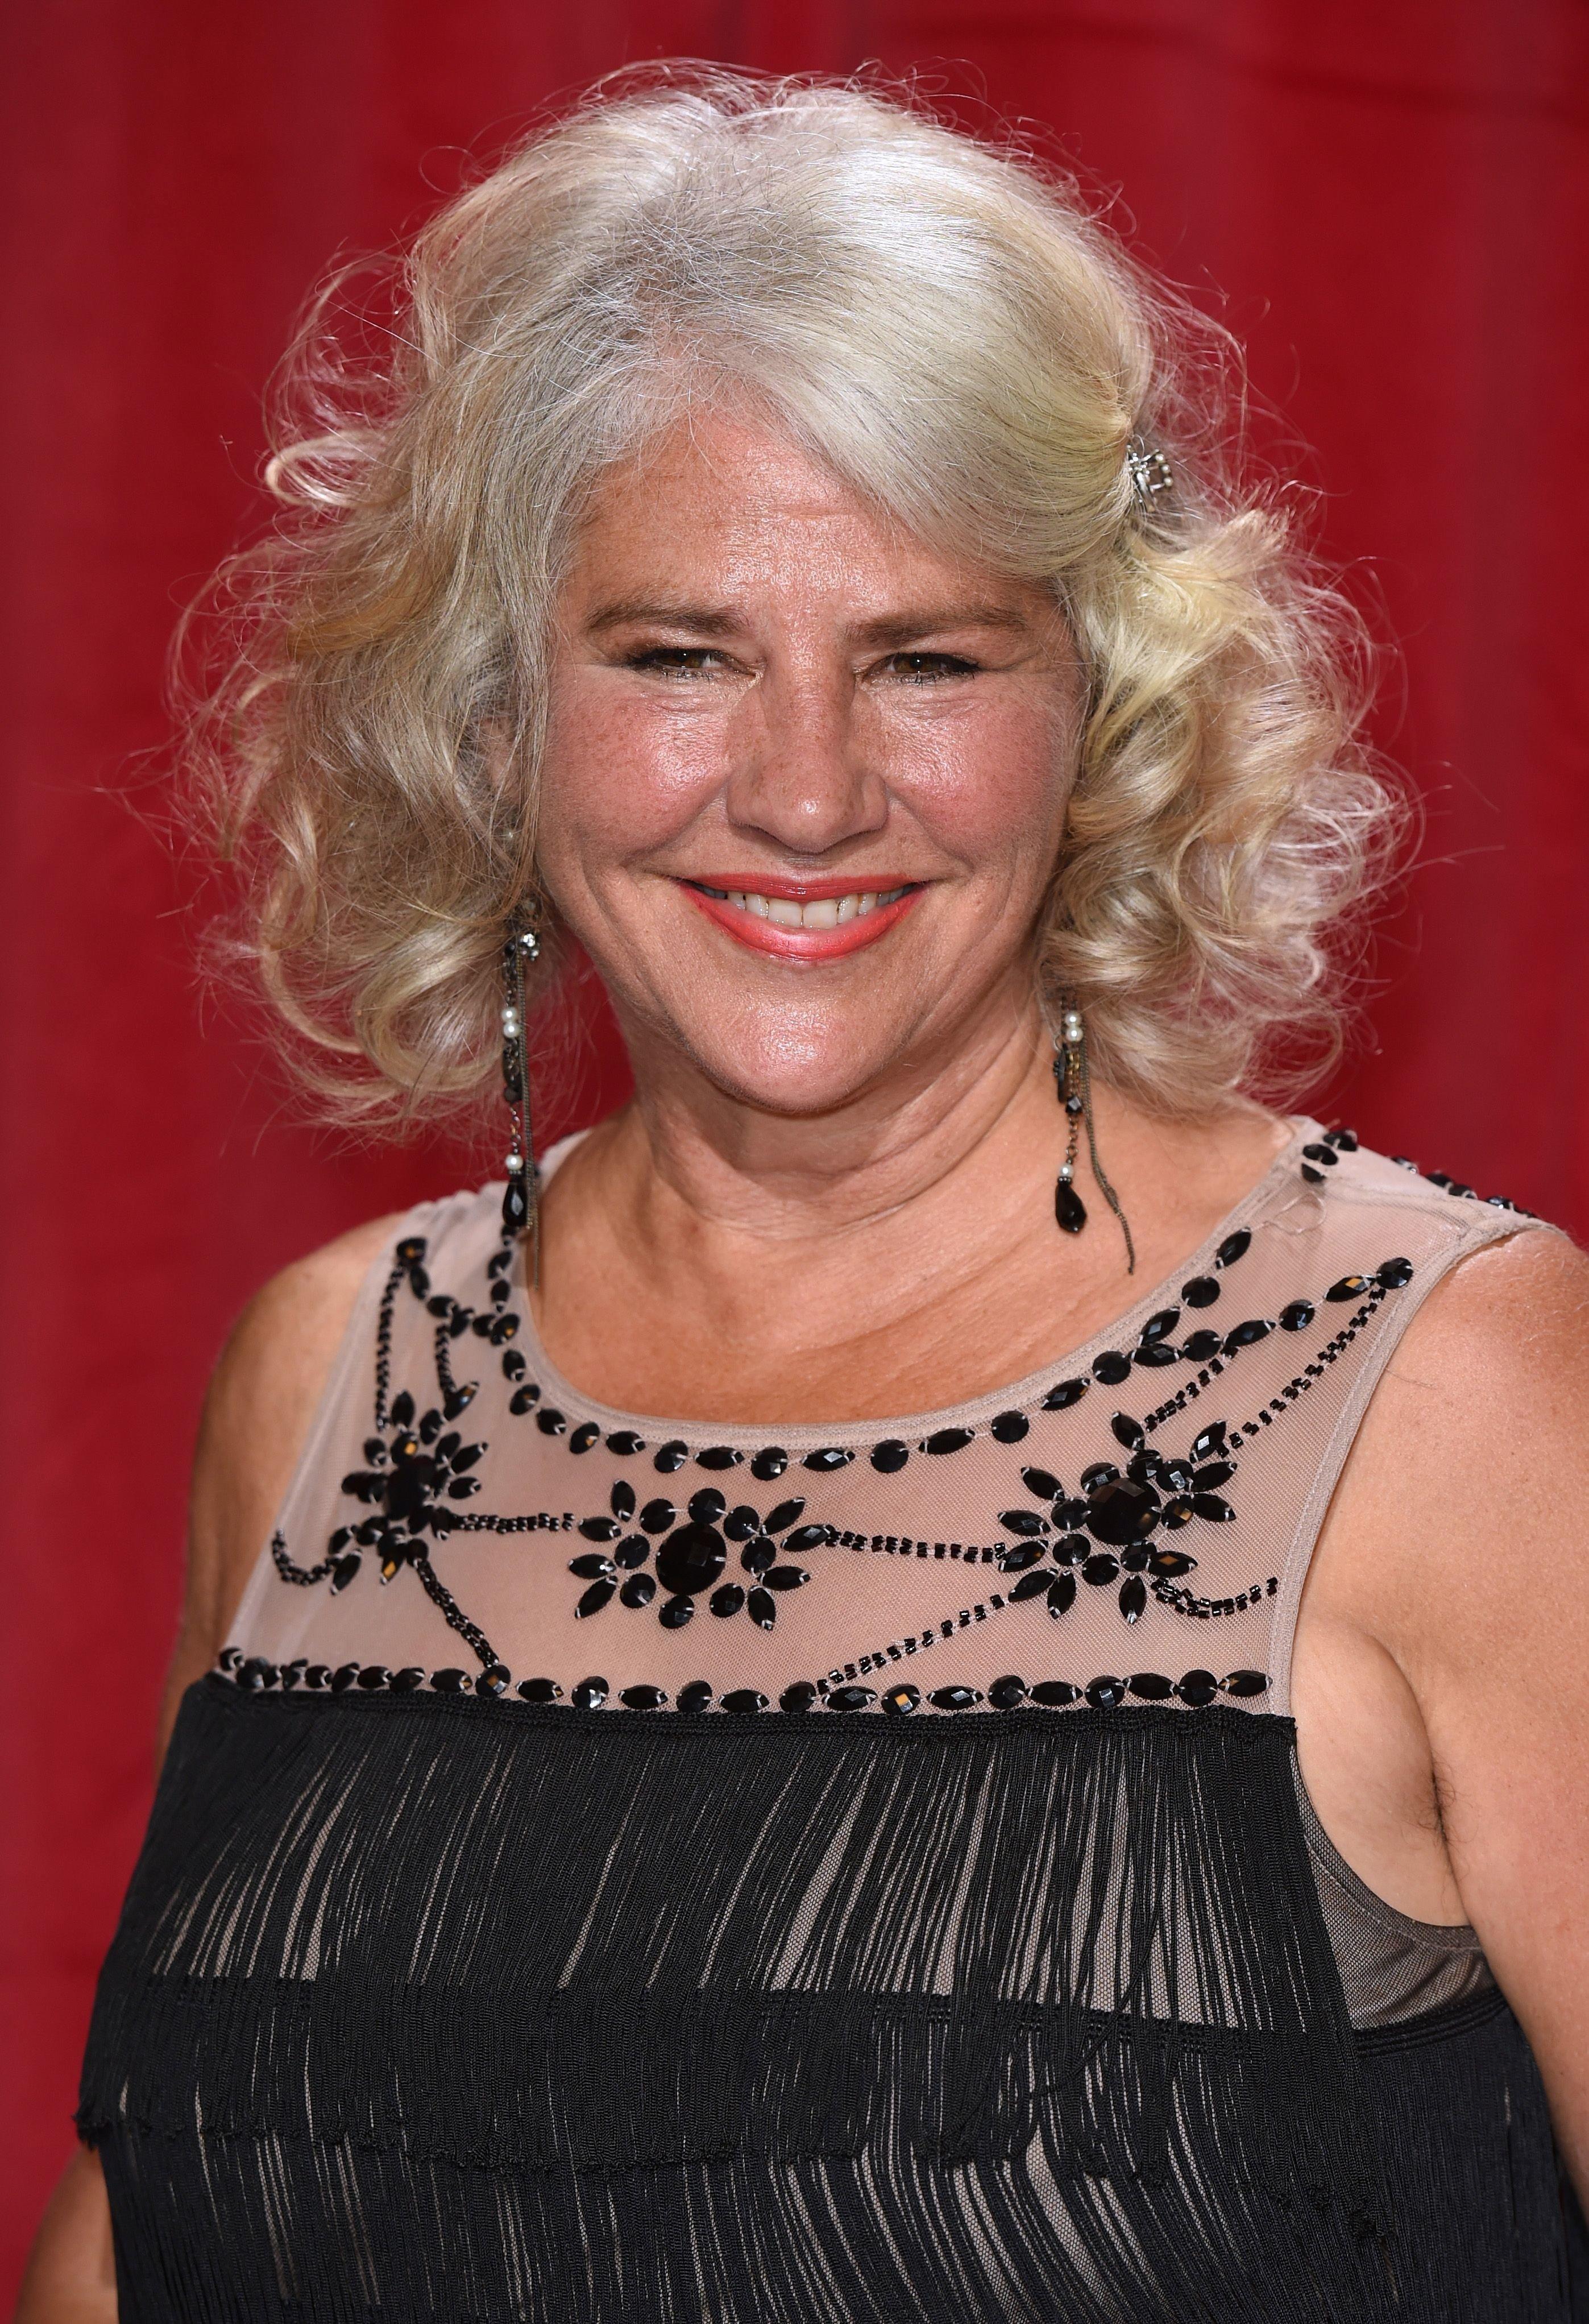 Is Denise Black Set For A 'Coronation Street'